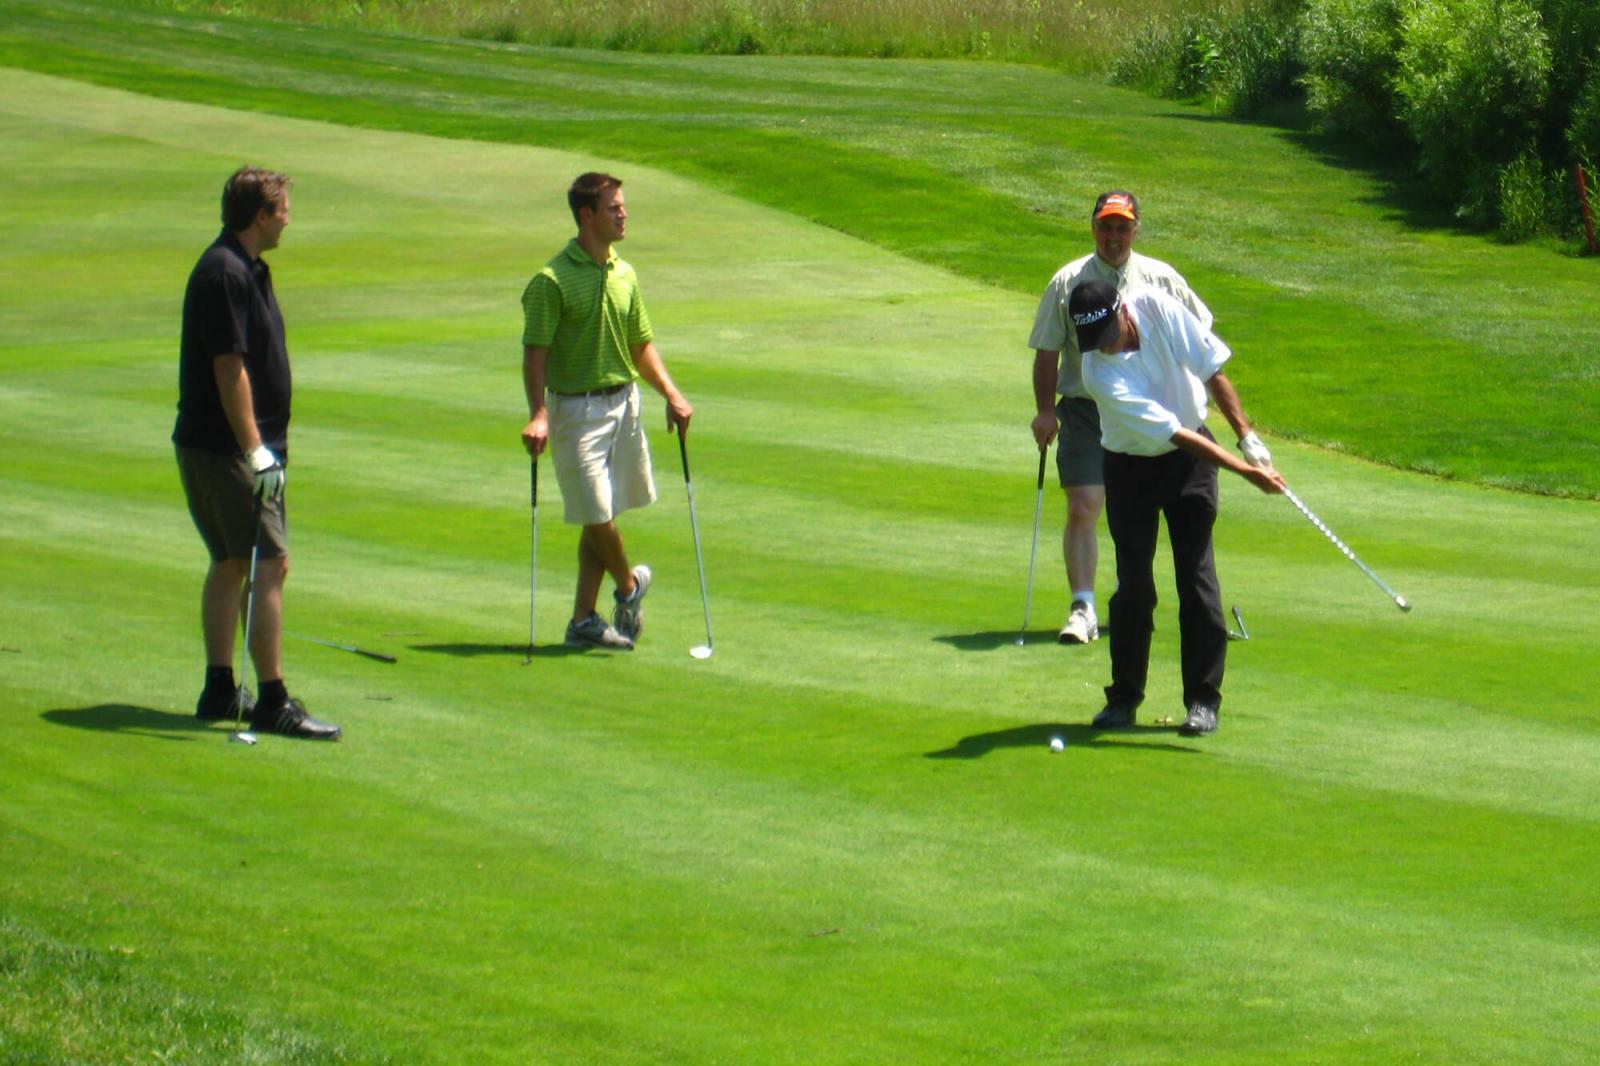 LO golf season offers many benefits